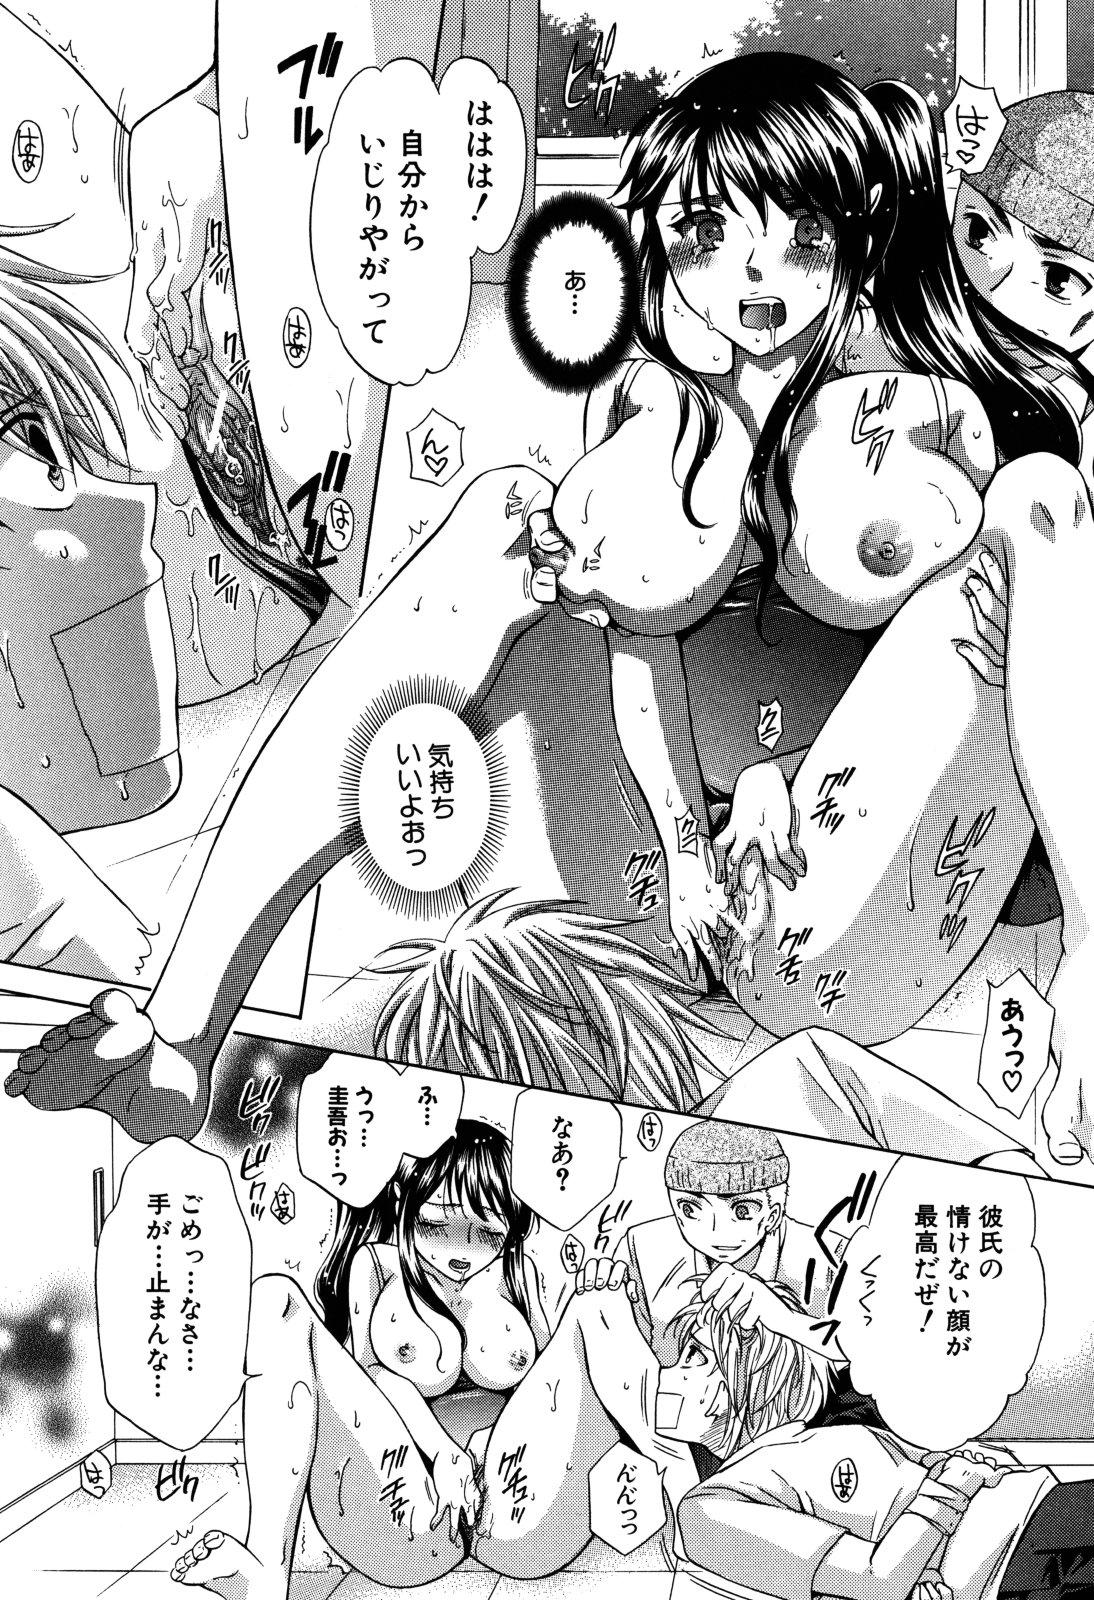 Kanojo ga Ochiru made - She in the depth 207